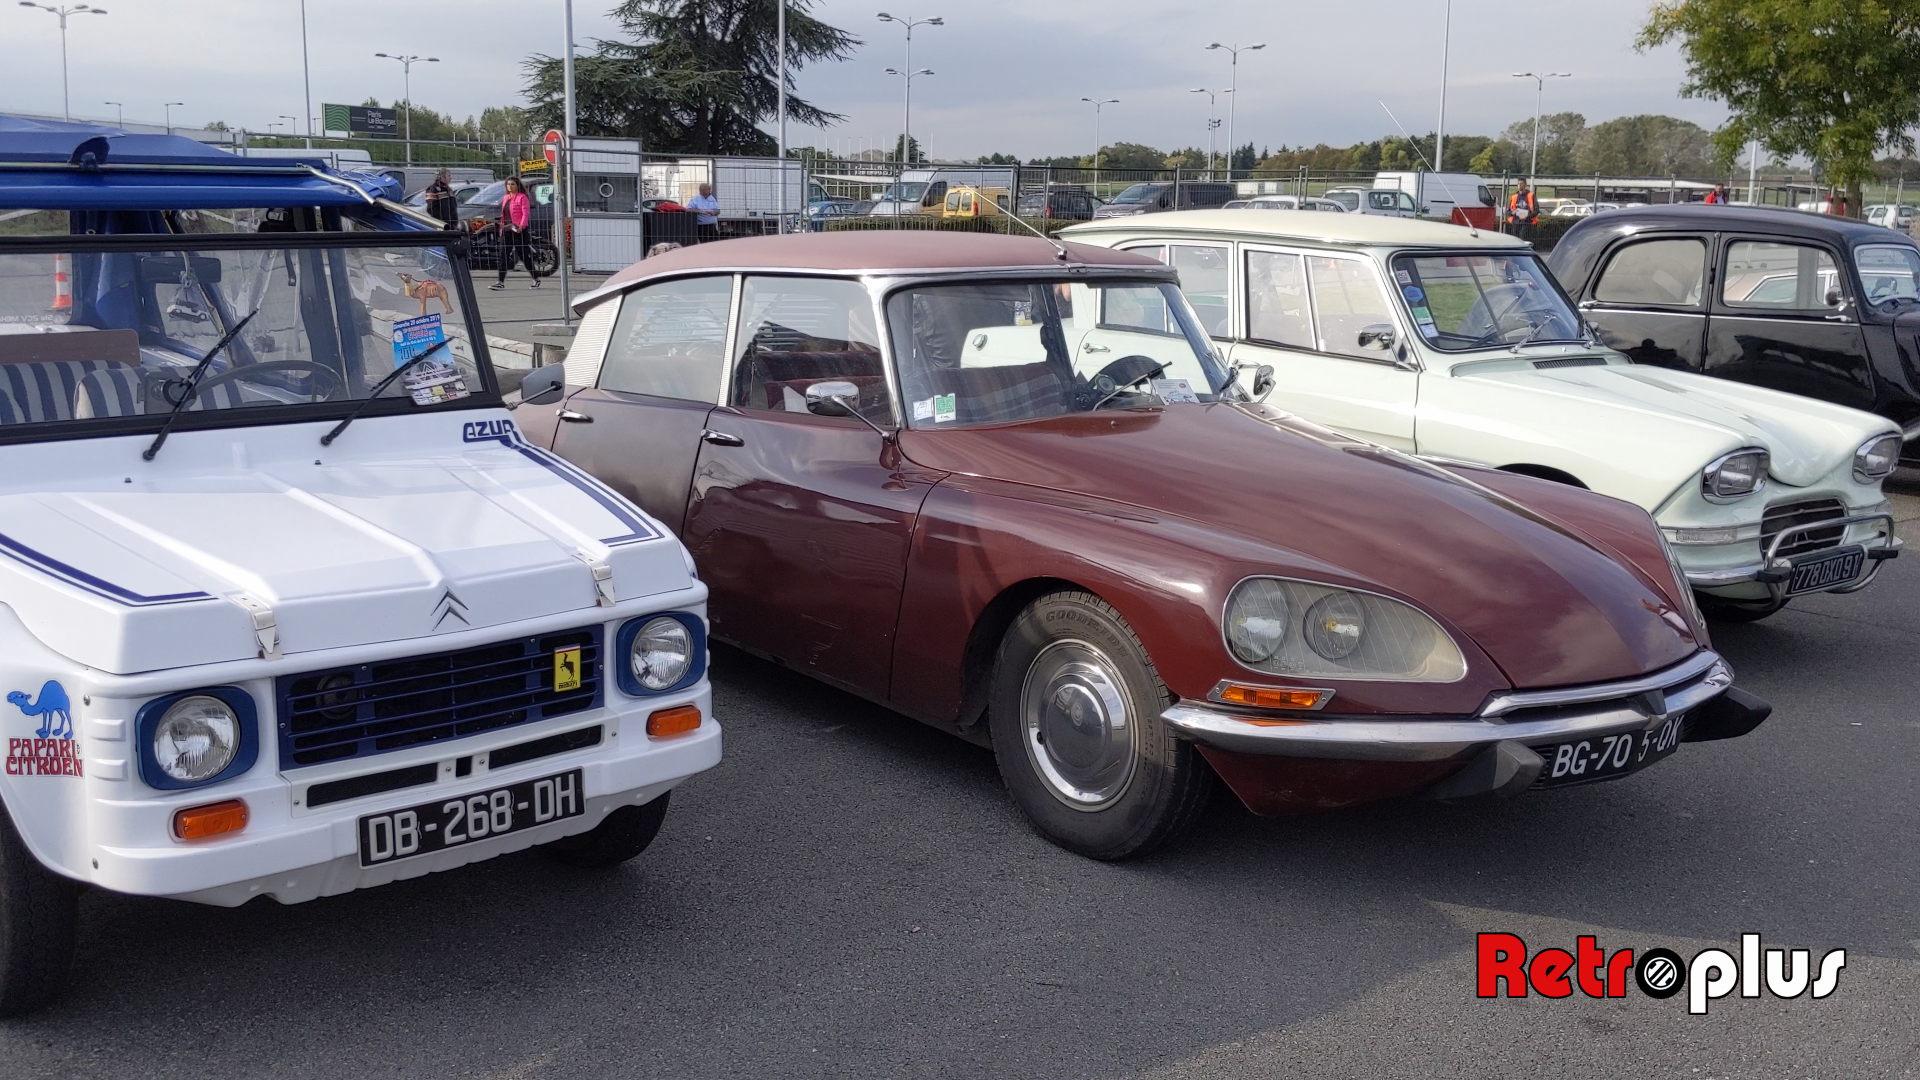 Automedon2019-parkingCitroen9